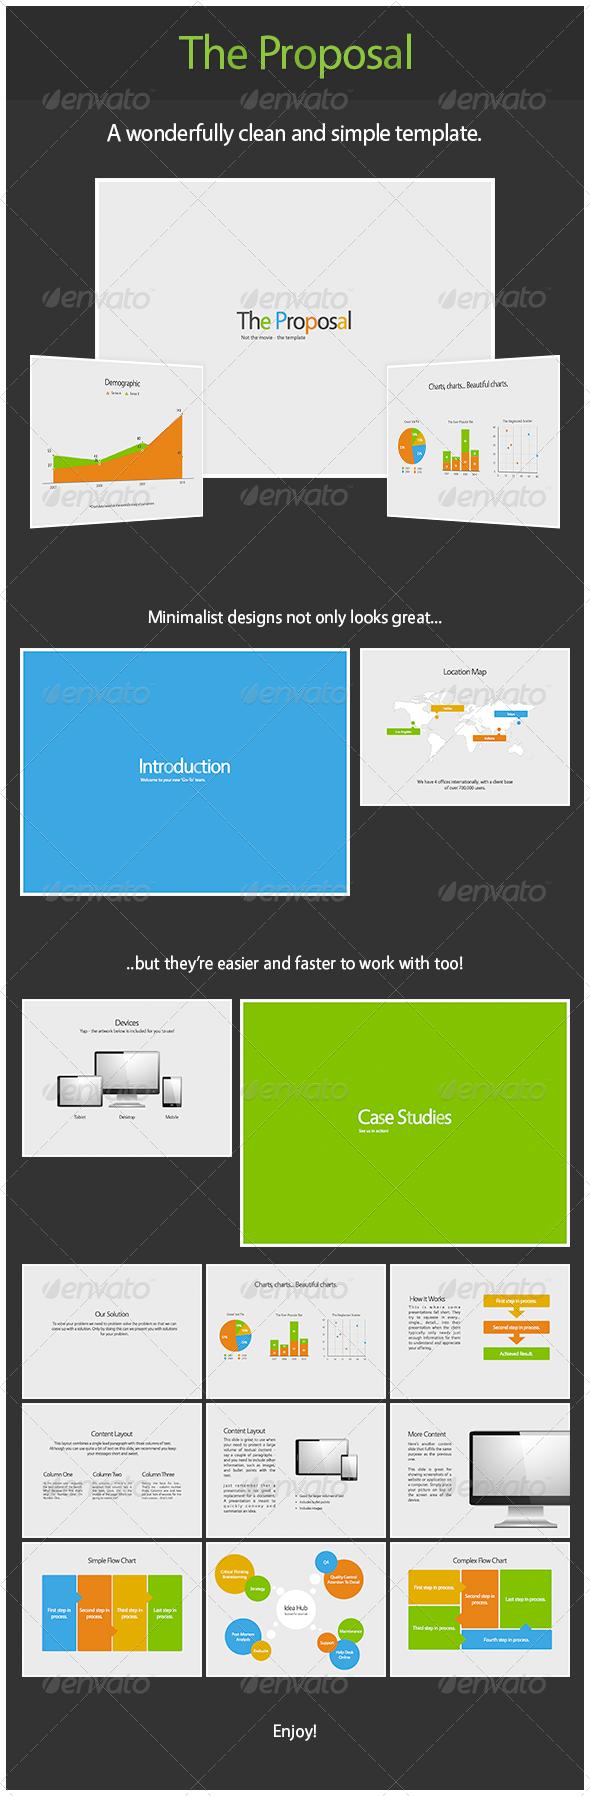 Tok presentation proposal example for Tok presentation template